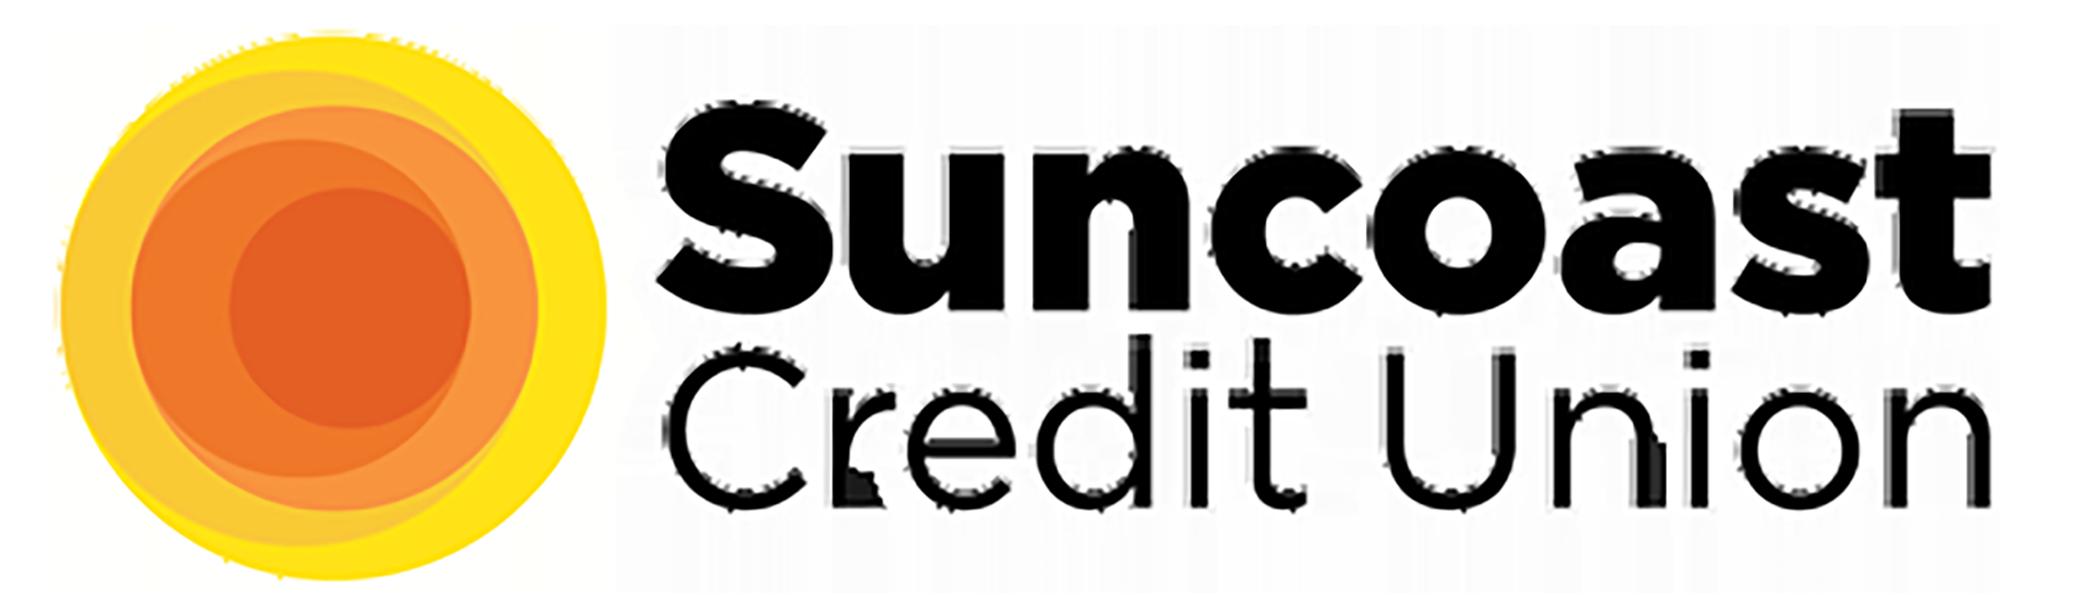 Suncoast Credit Union no background